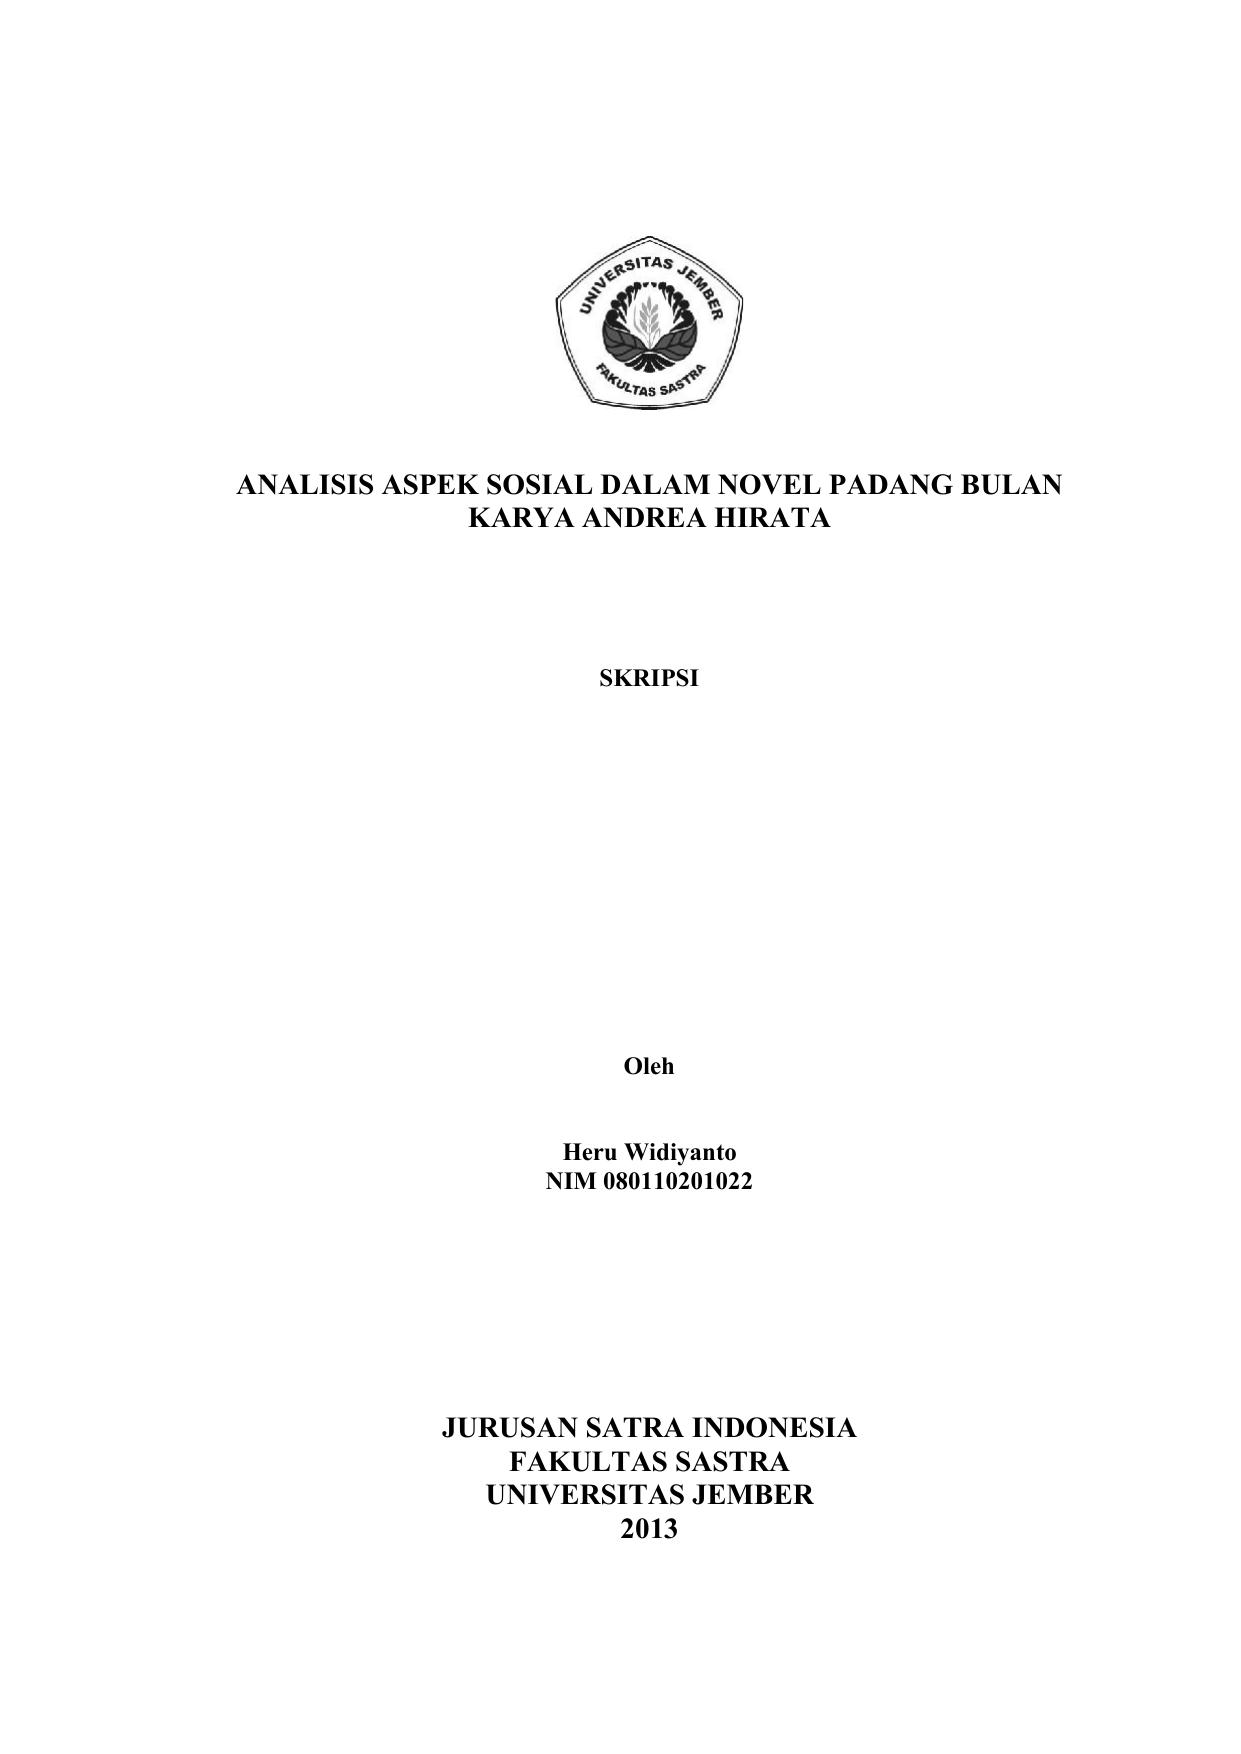 Analisis Aspek Sosial Dalam Novel Padang Bulan Karya Andrea Hirata